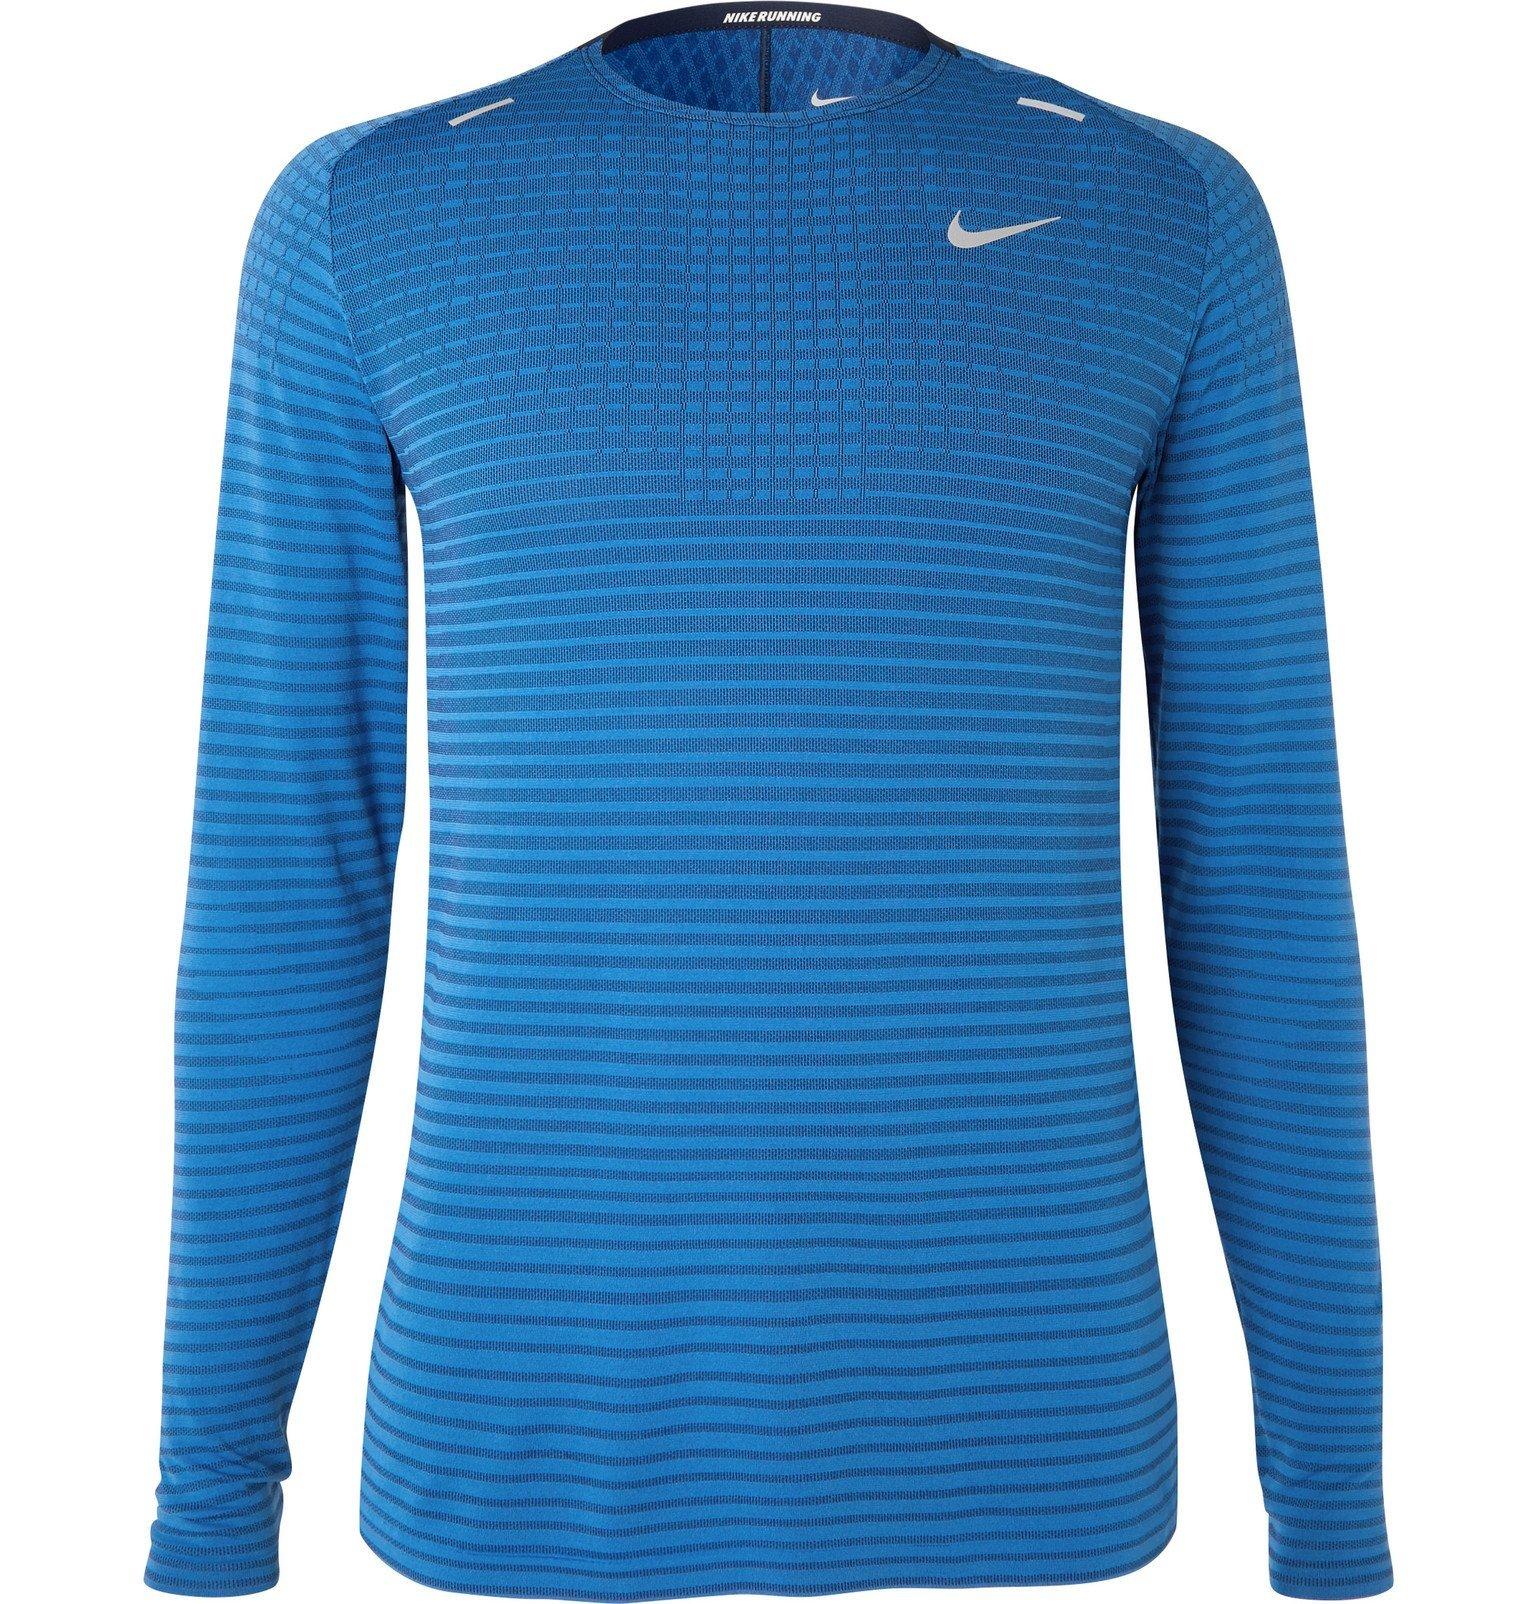 Nike Running - Ultra Slim-Fit TechKnit T-Shirt - Blue